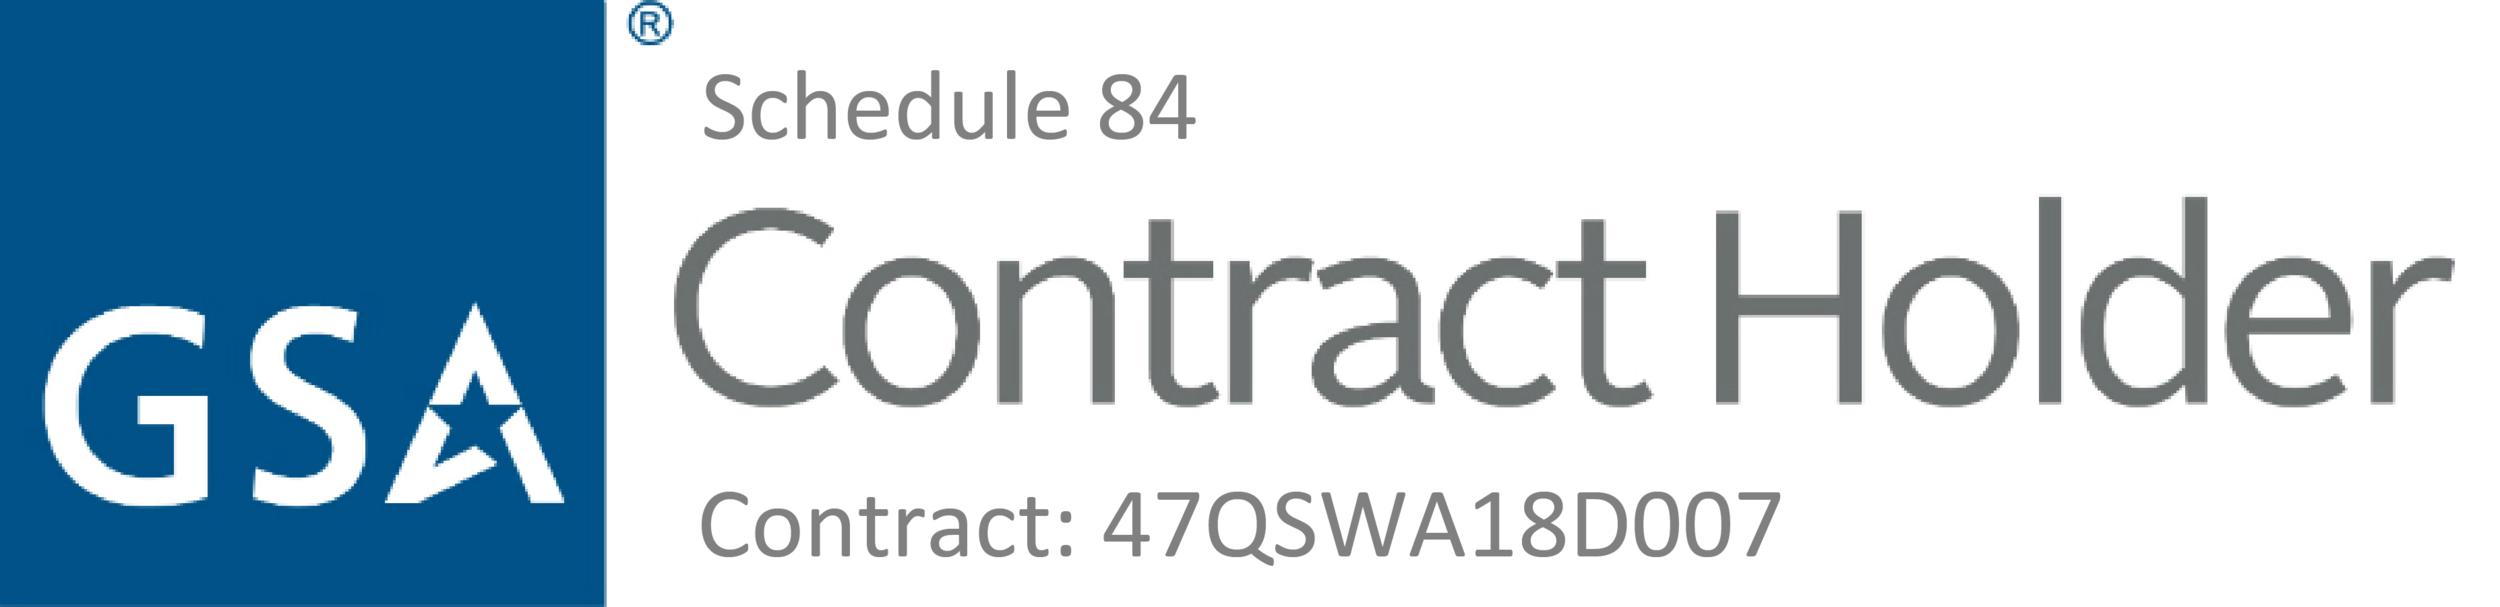 GSA-Contract-Holder-Logo-v4.png